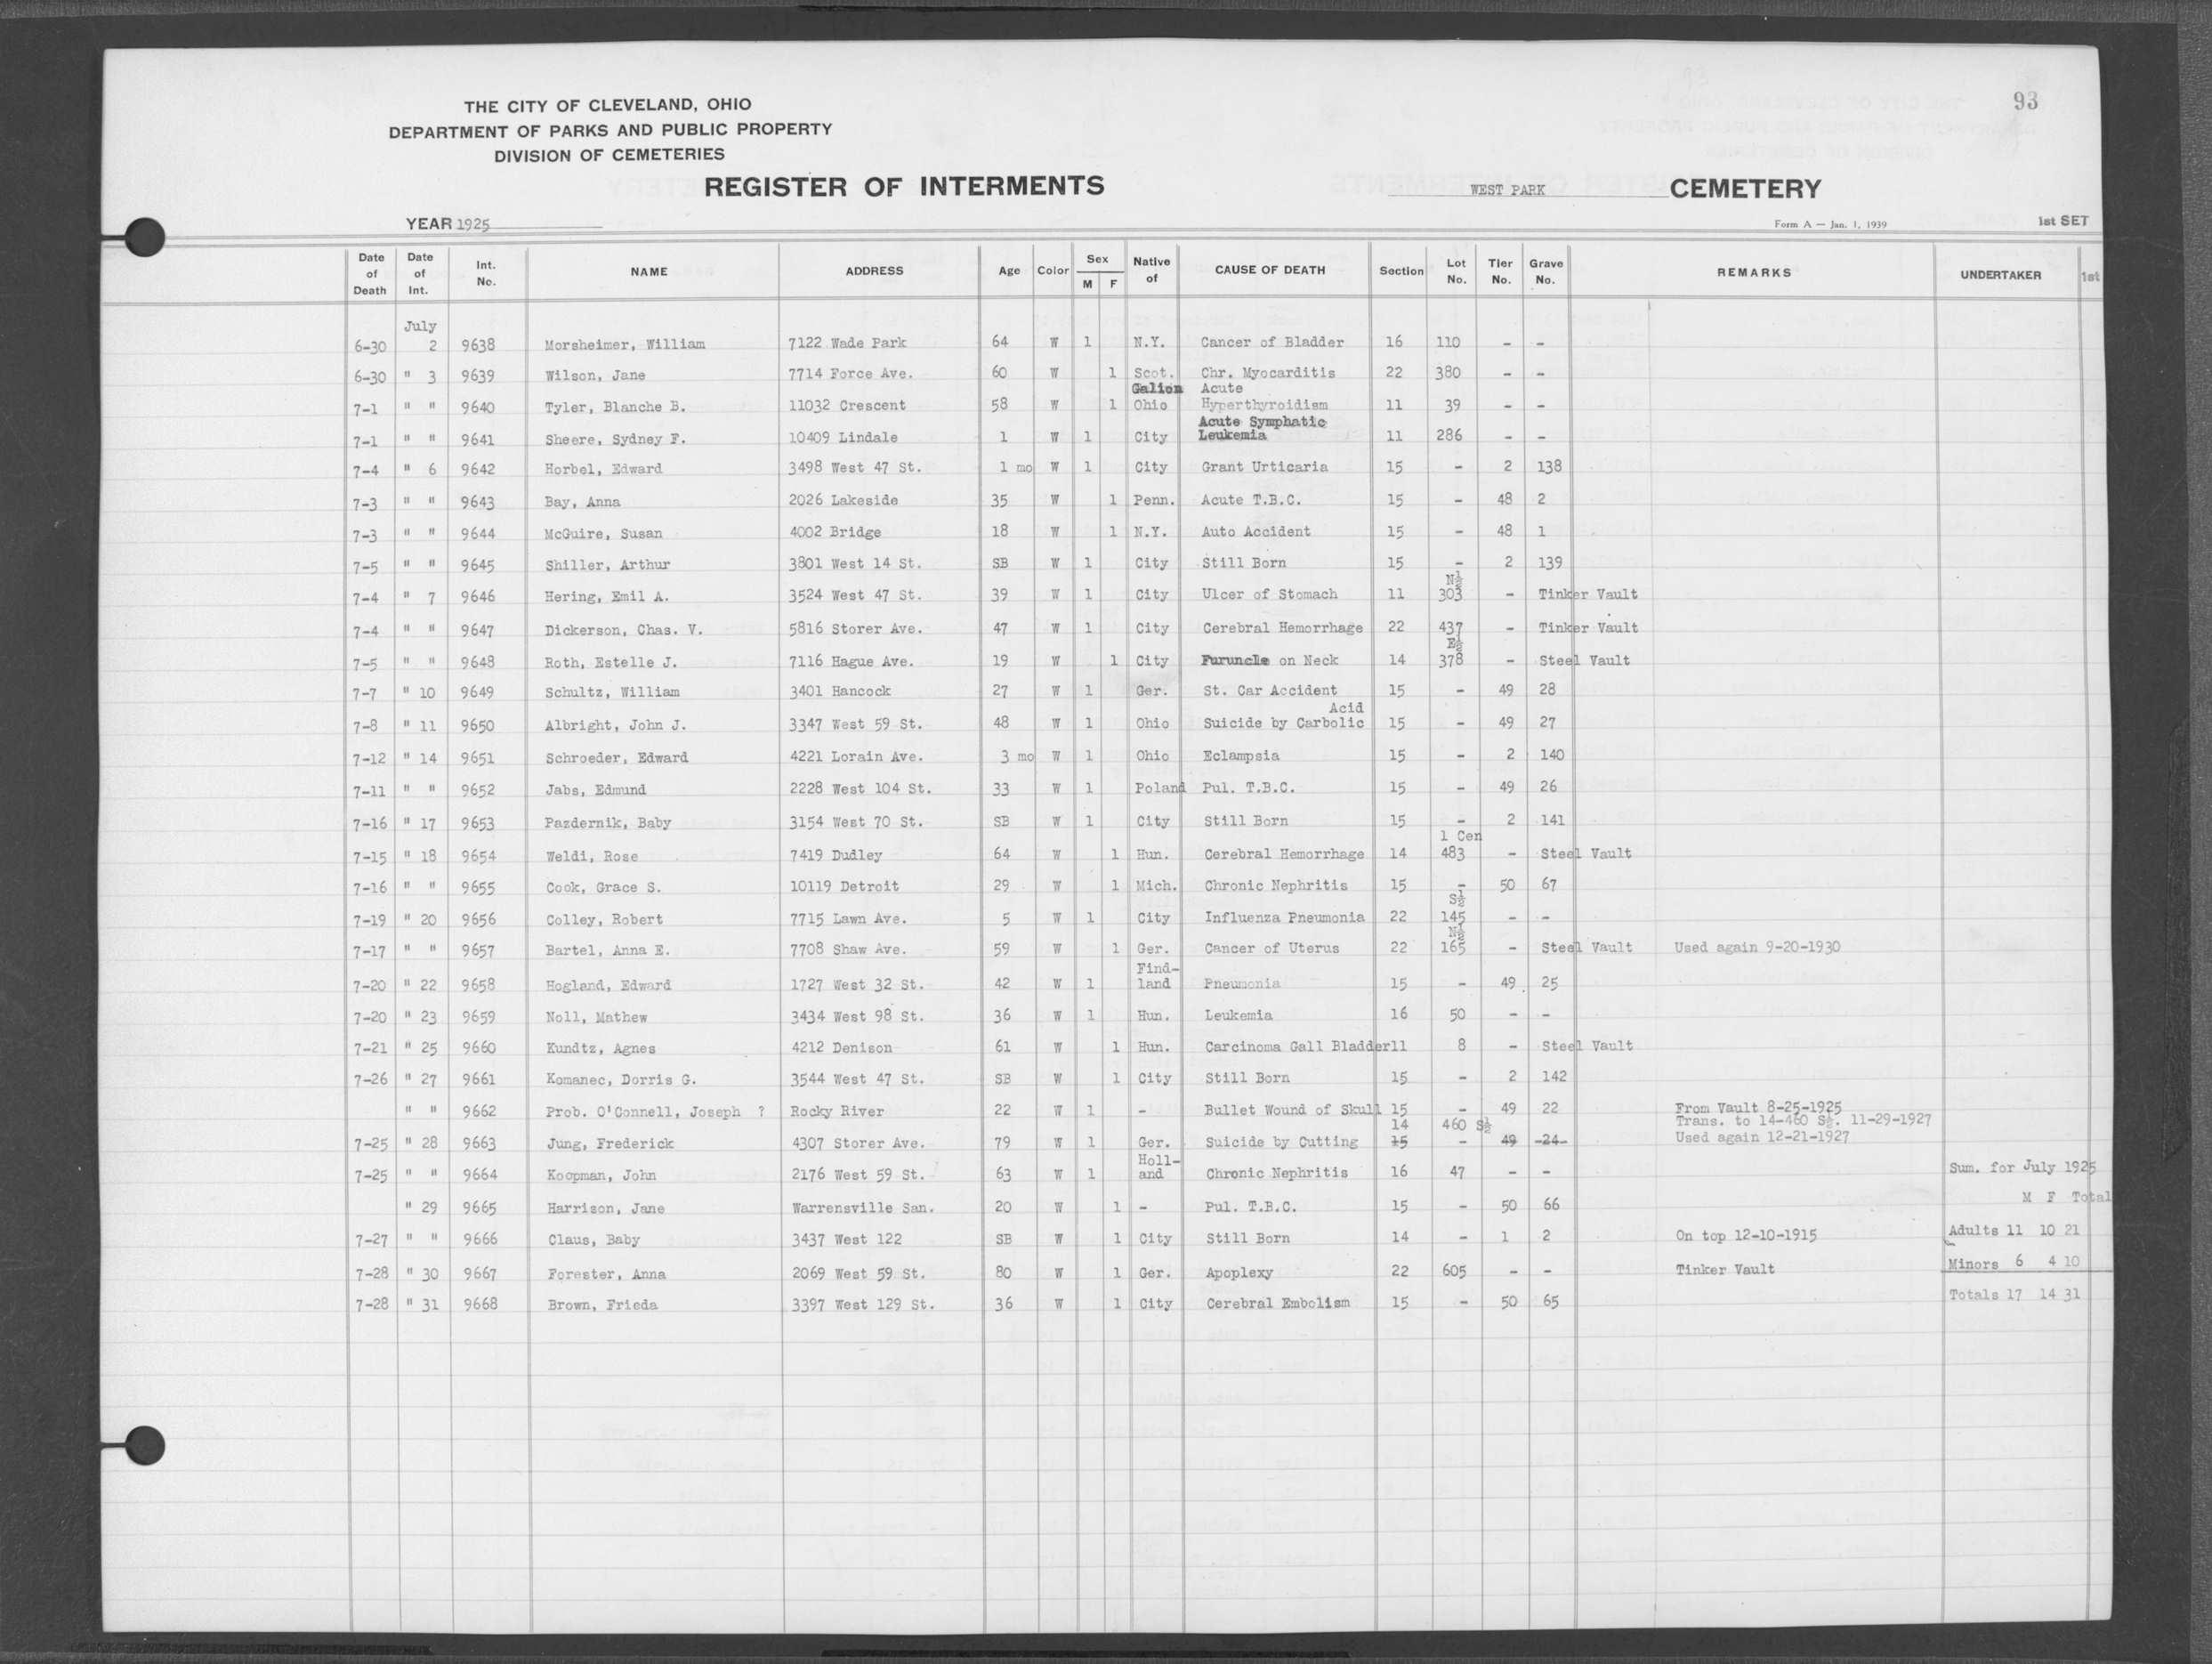 West Park Cemetery Index Fl Through Gon